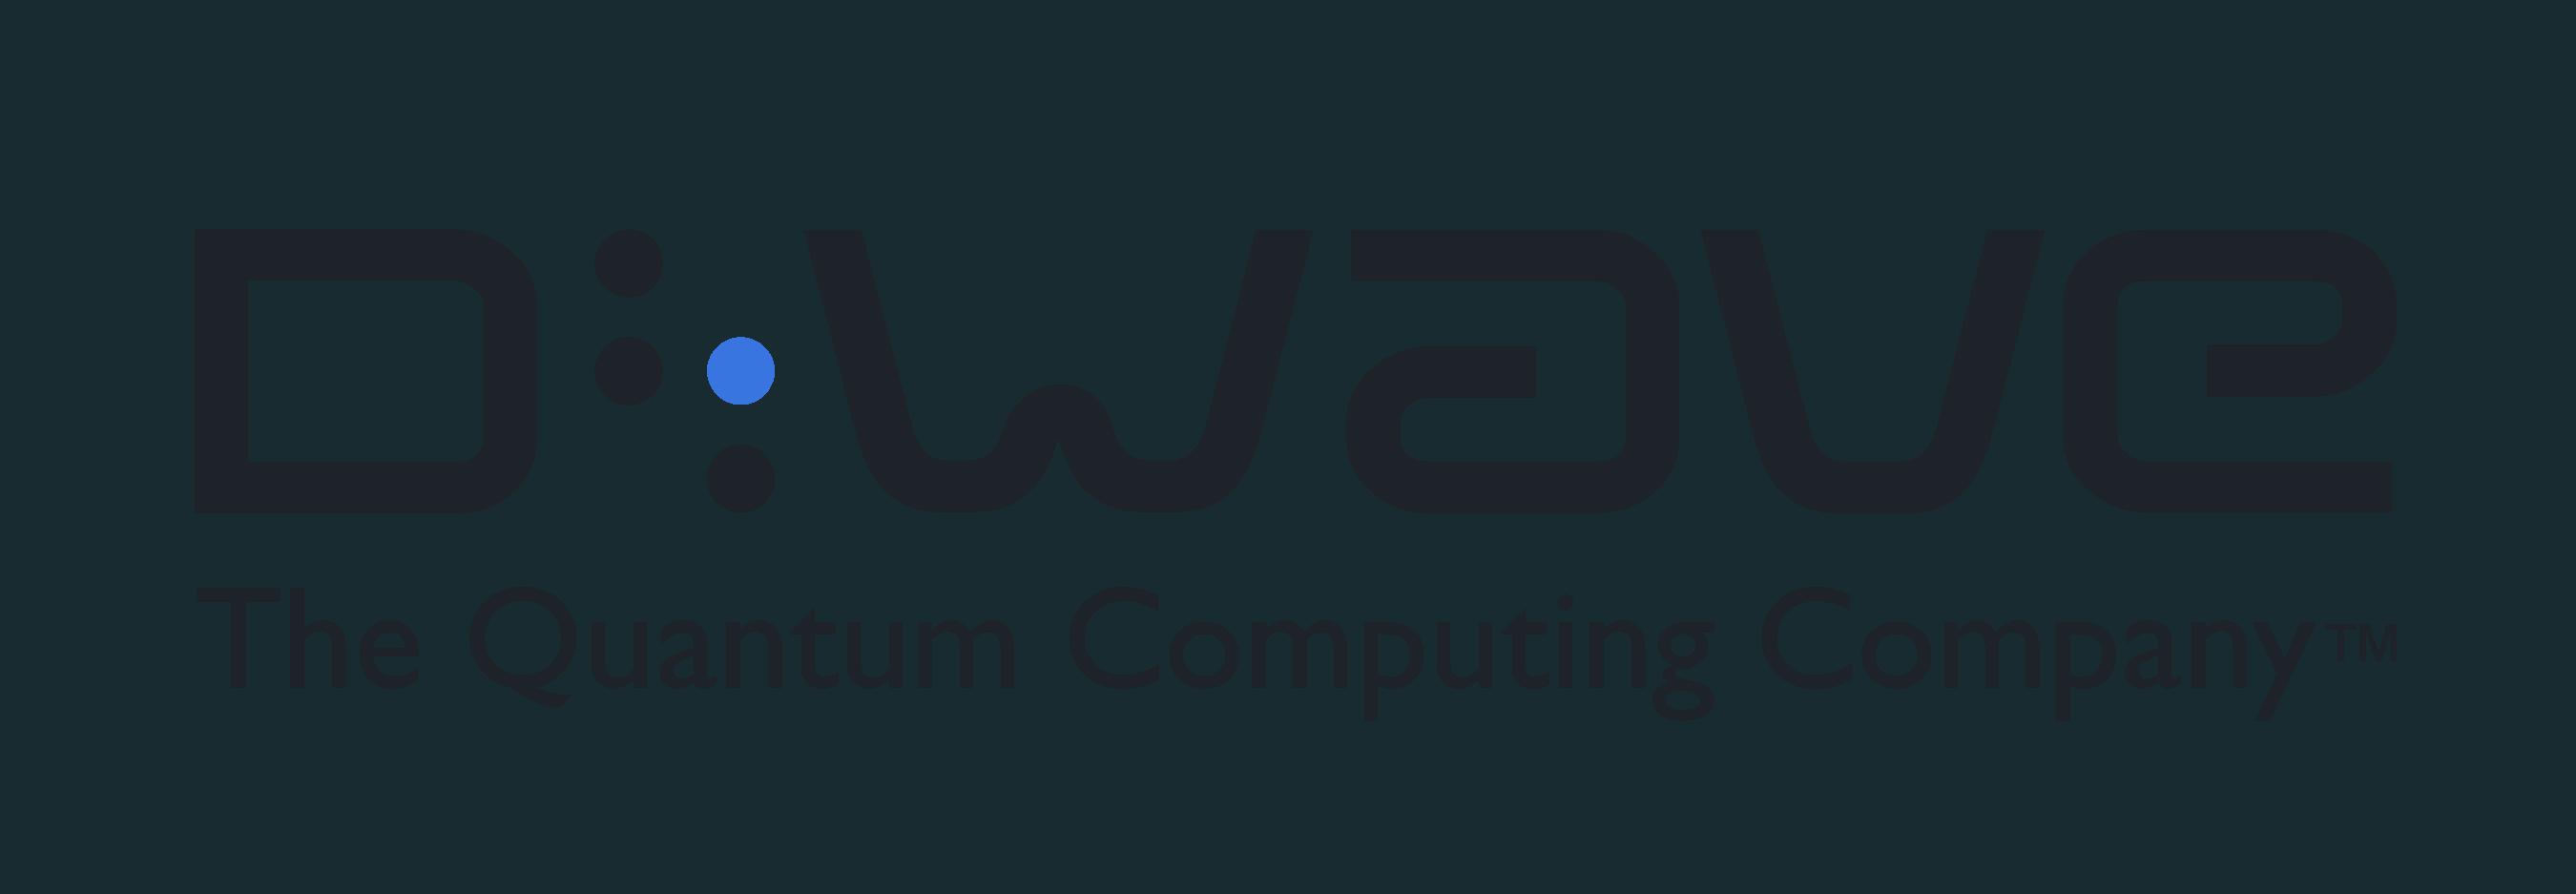 D Wave System